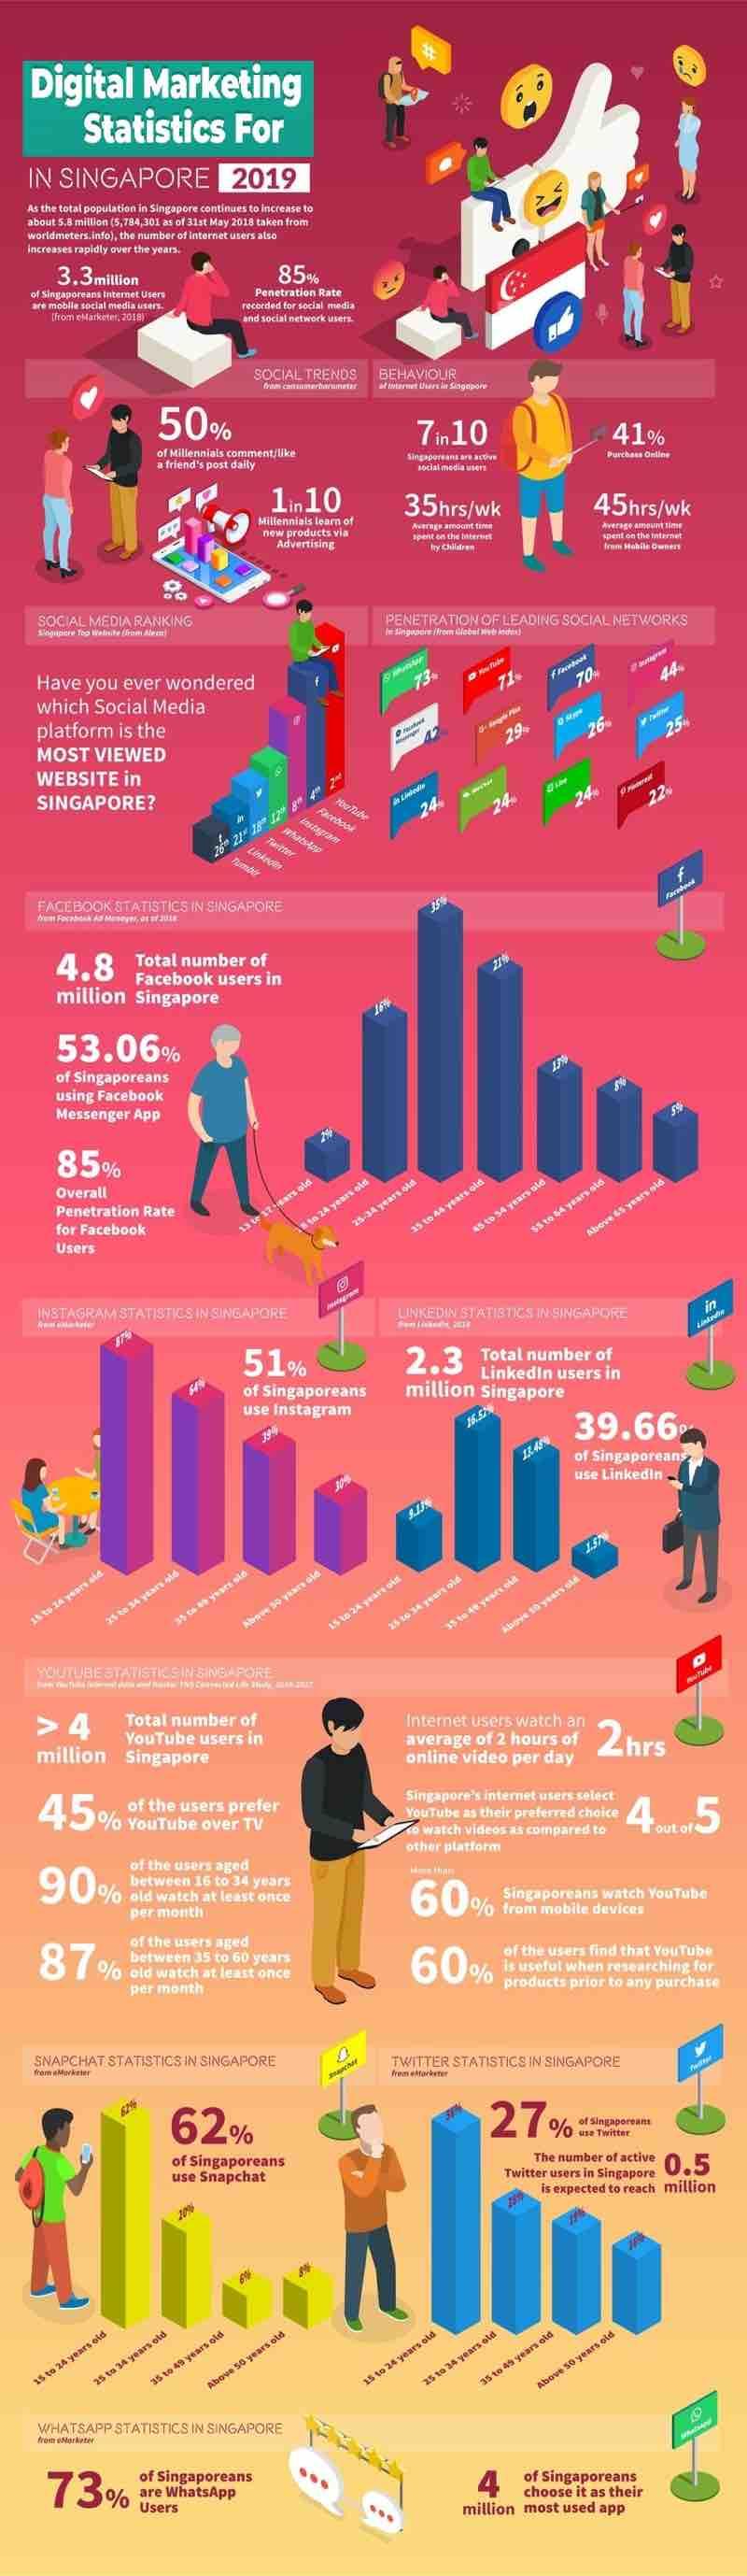 top internet statistics in singapore